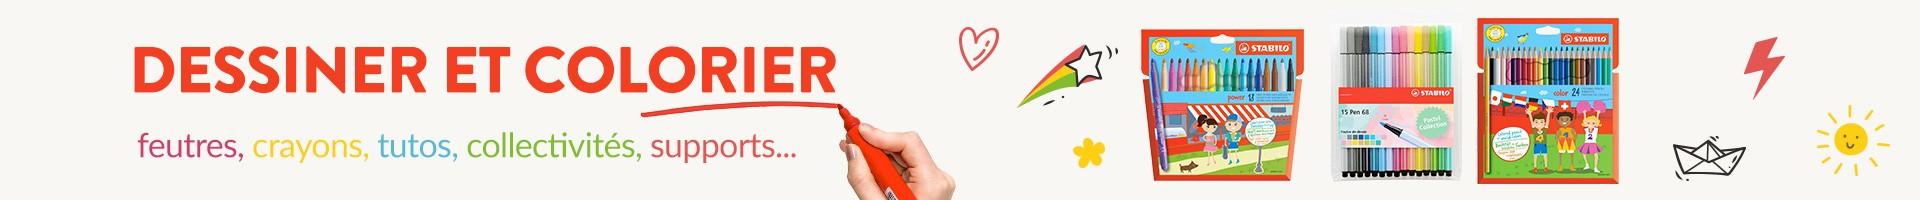 Dessiner et colorier